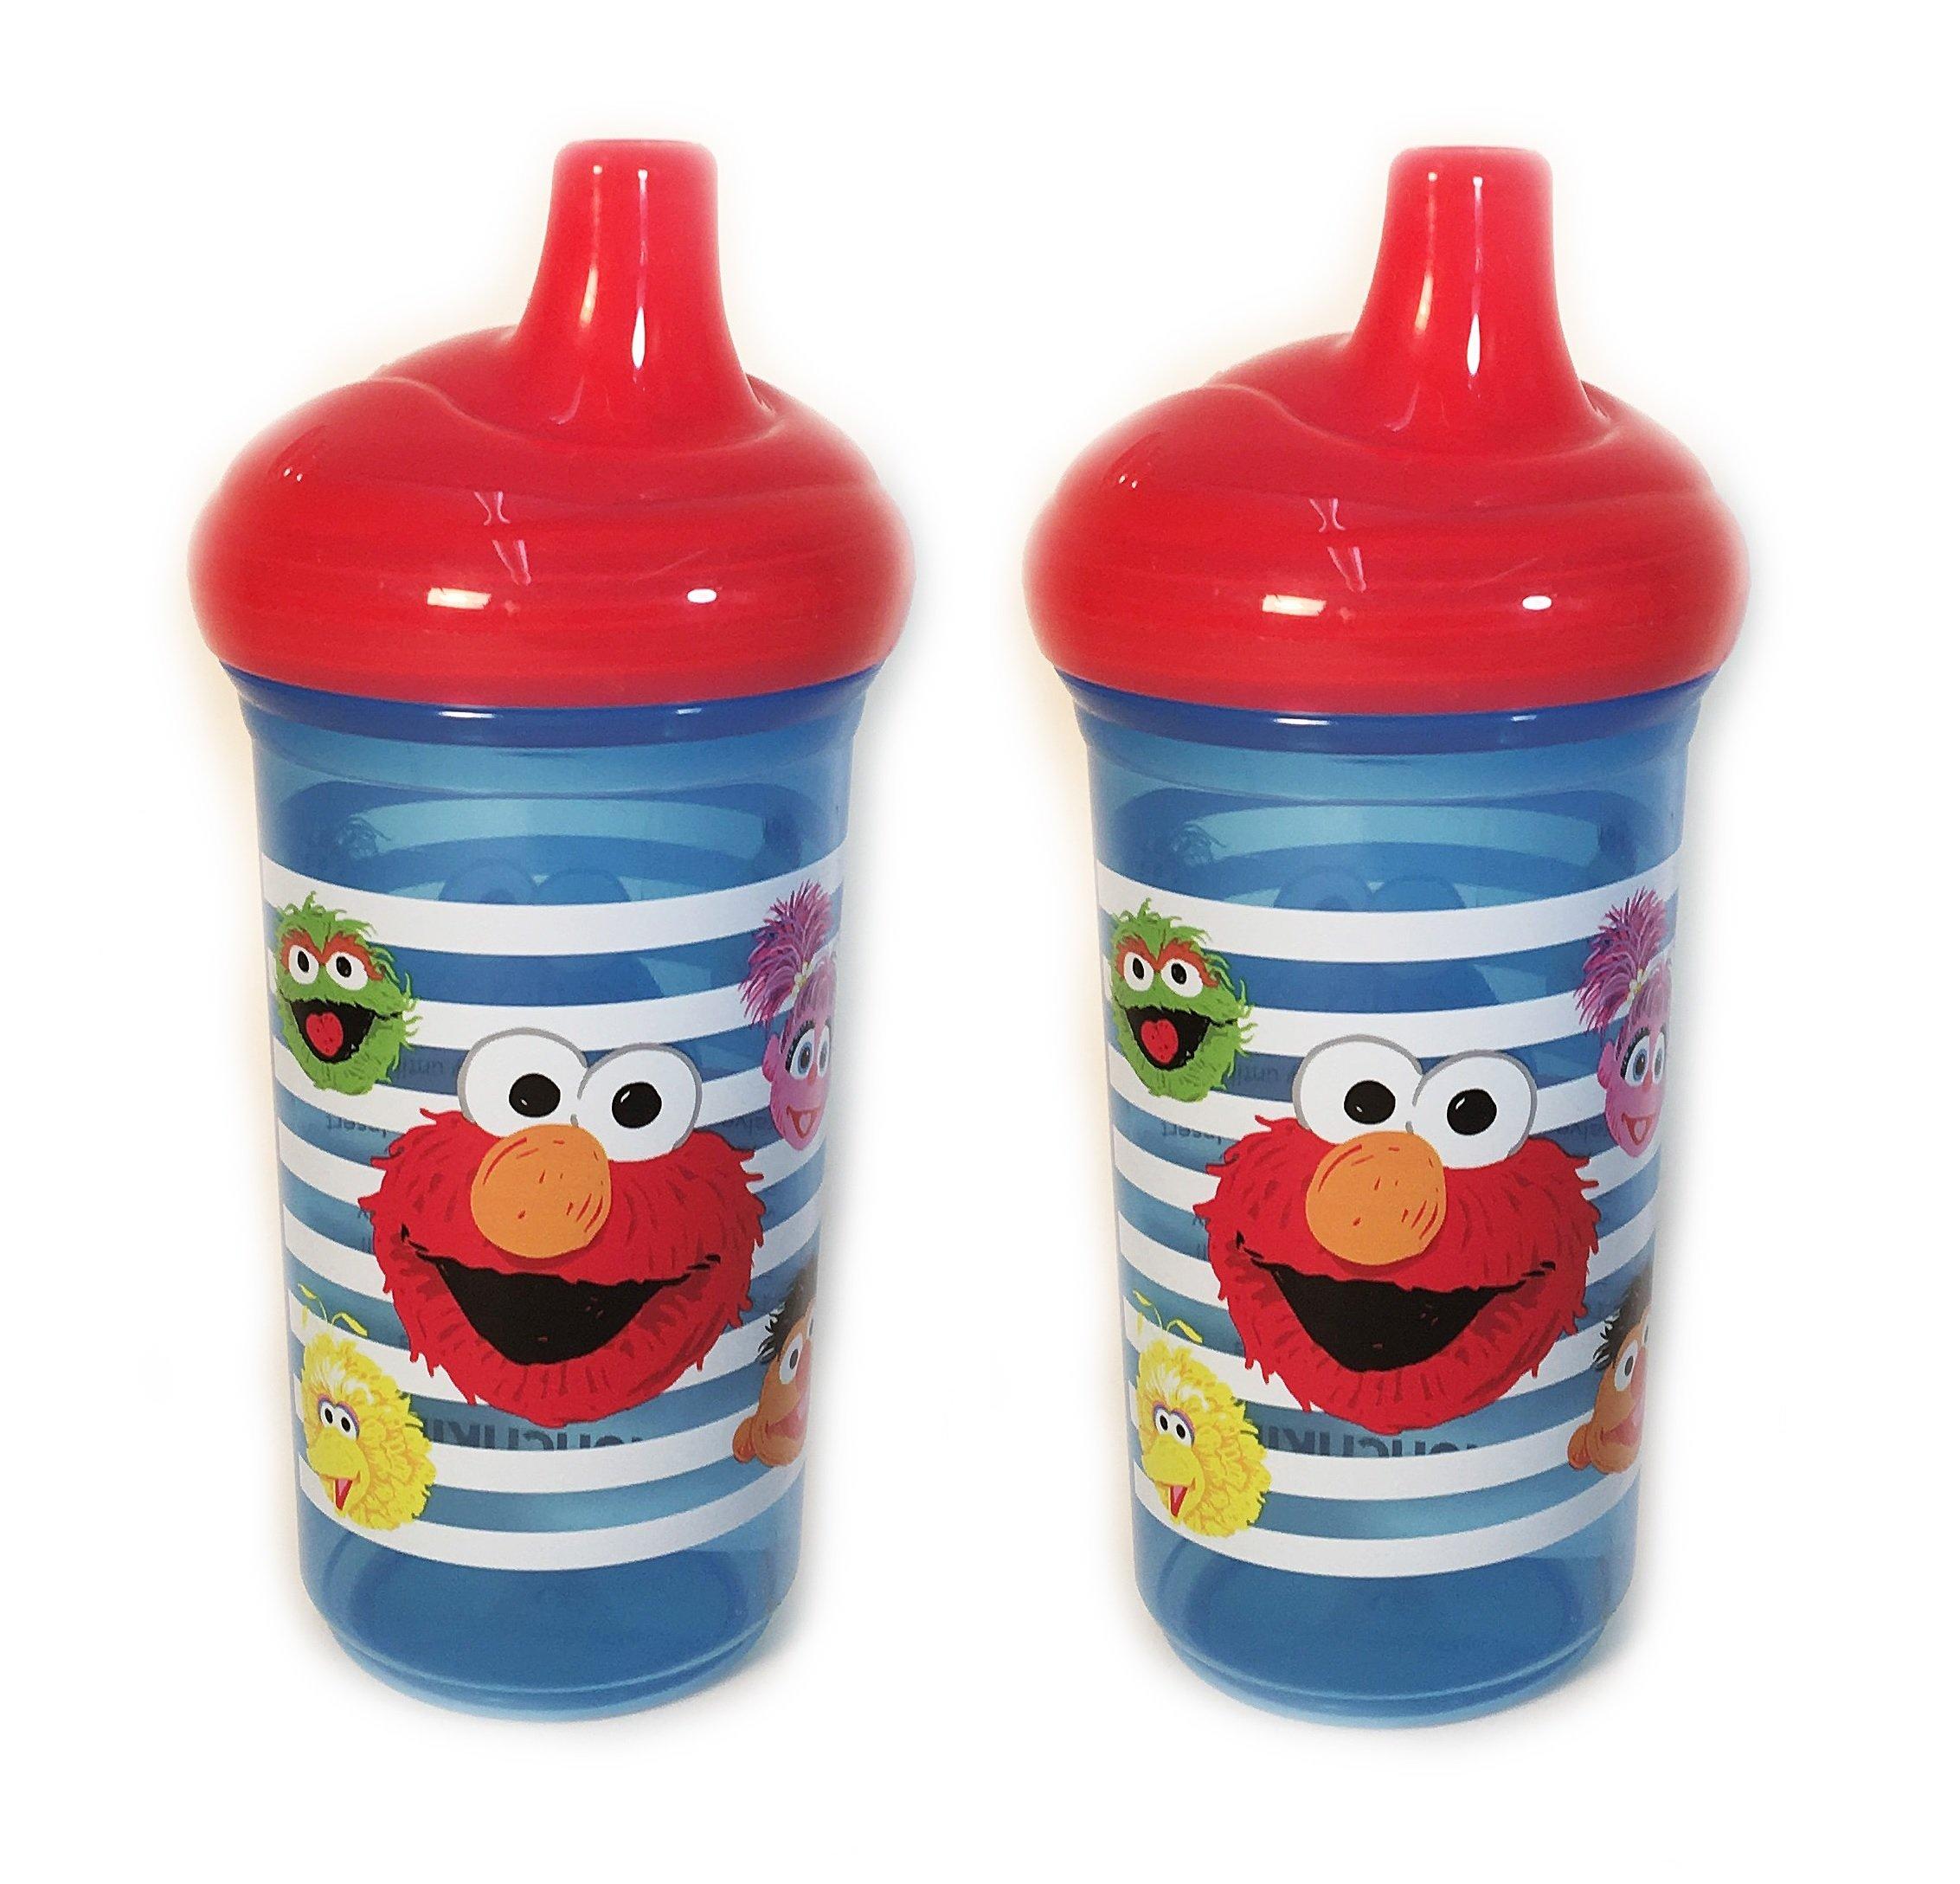 Set of 2 Munchkins Sesame Street 9 oz Sippy Cups  sc 1 st  Amazon.com & Amazon.com : Munchkin Sesame Street Dining Set : Baby Dinnerware ...